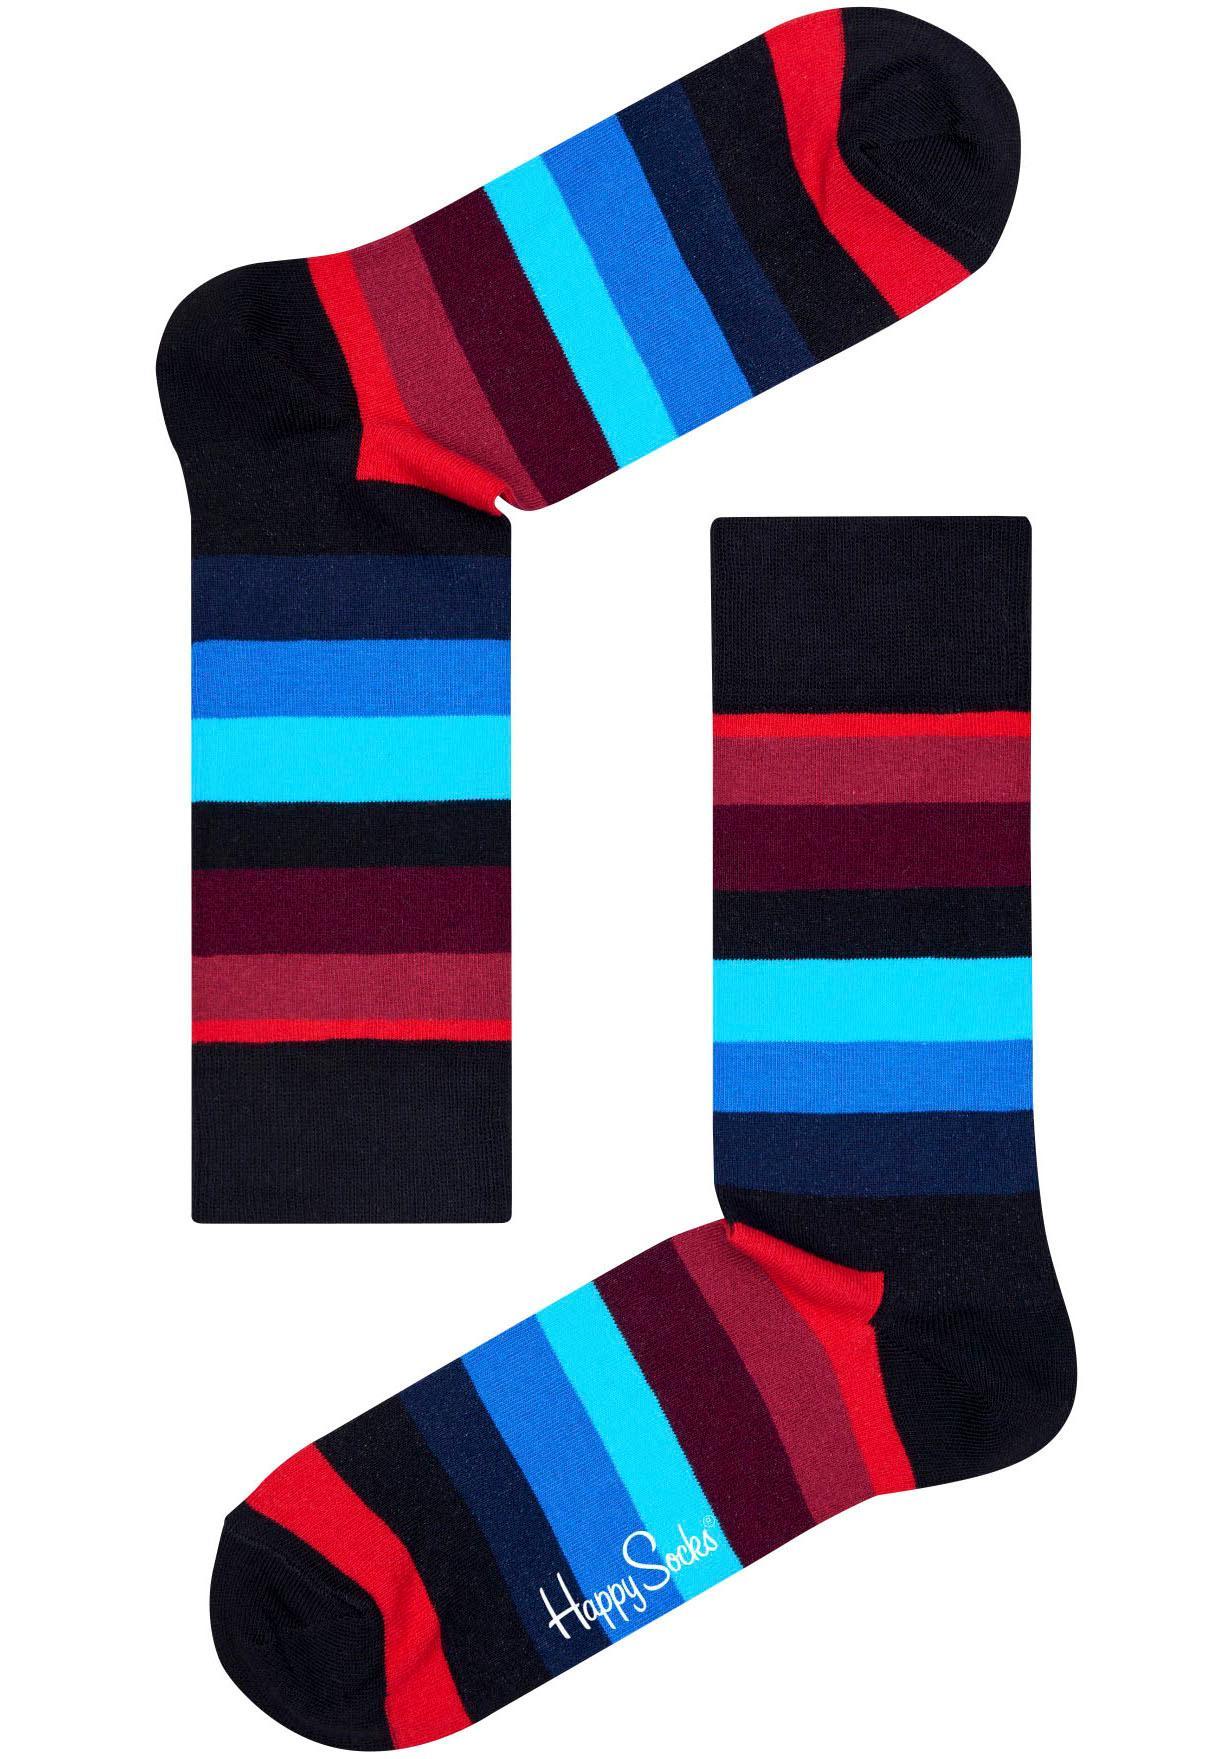 Happy Socks Socken Stripe   Bekleidung > Wäsche   Bunt   Happy Socks